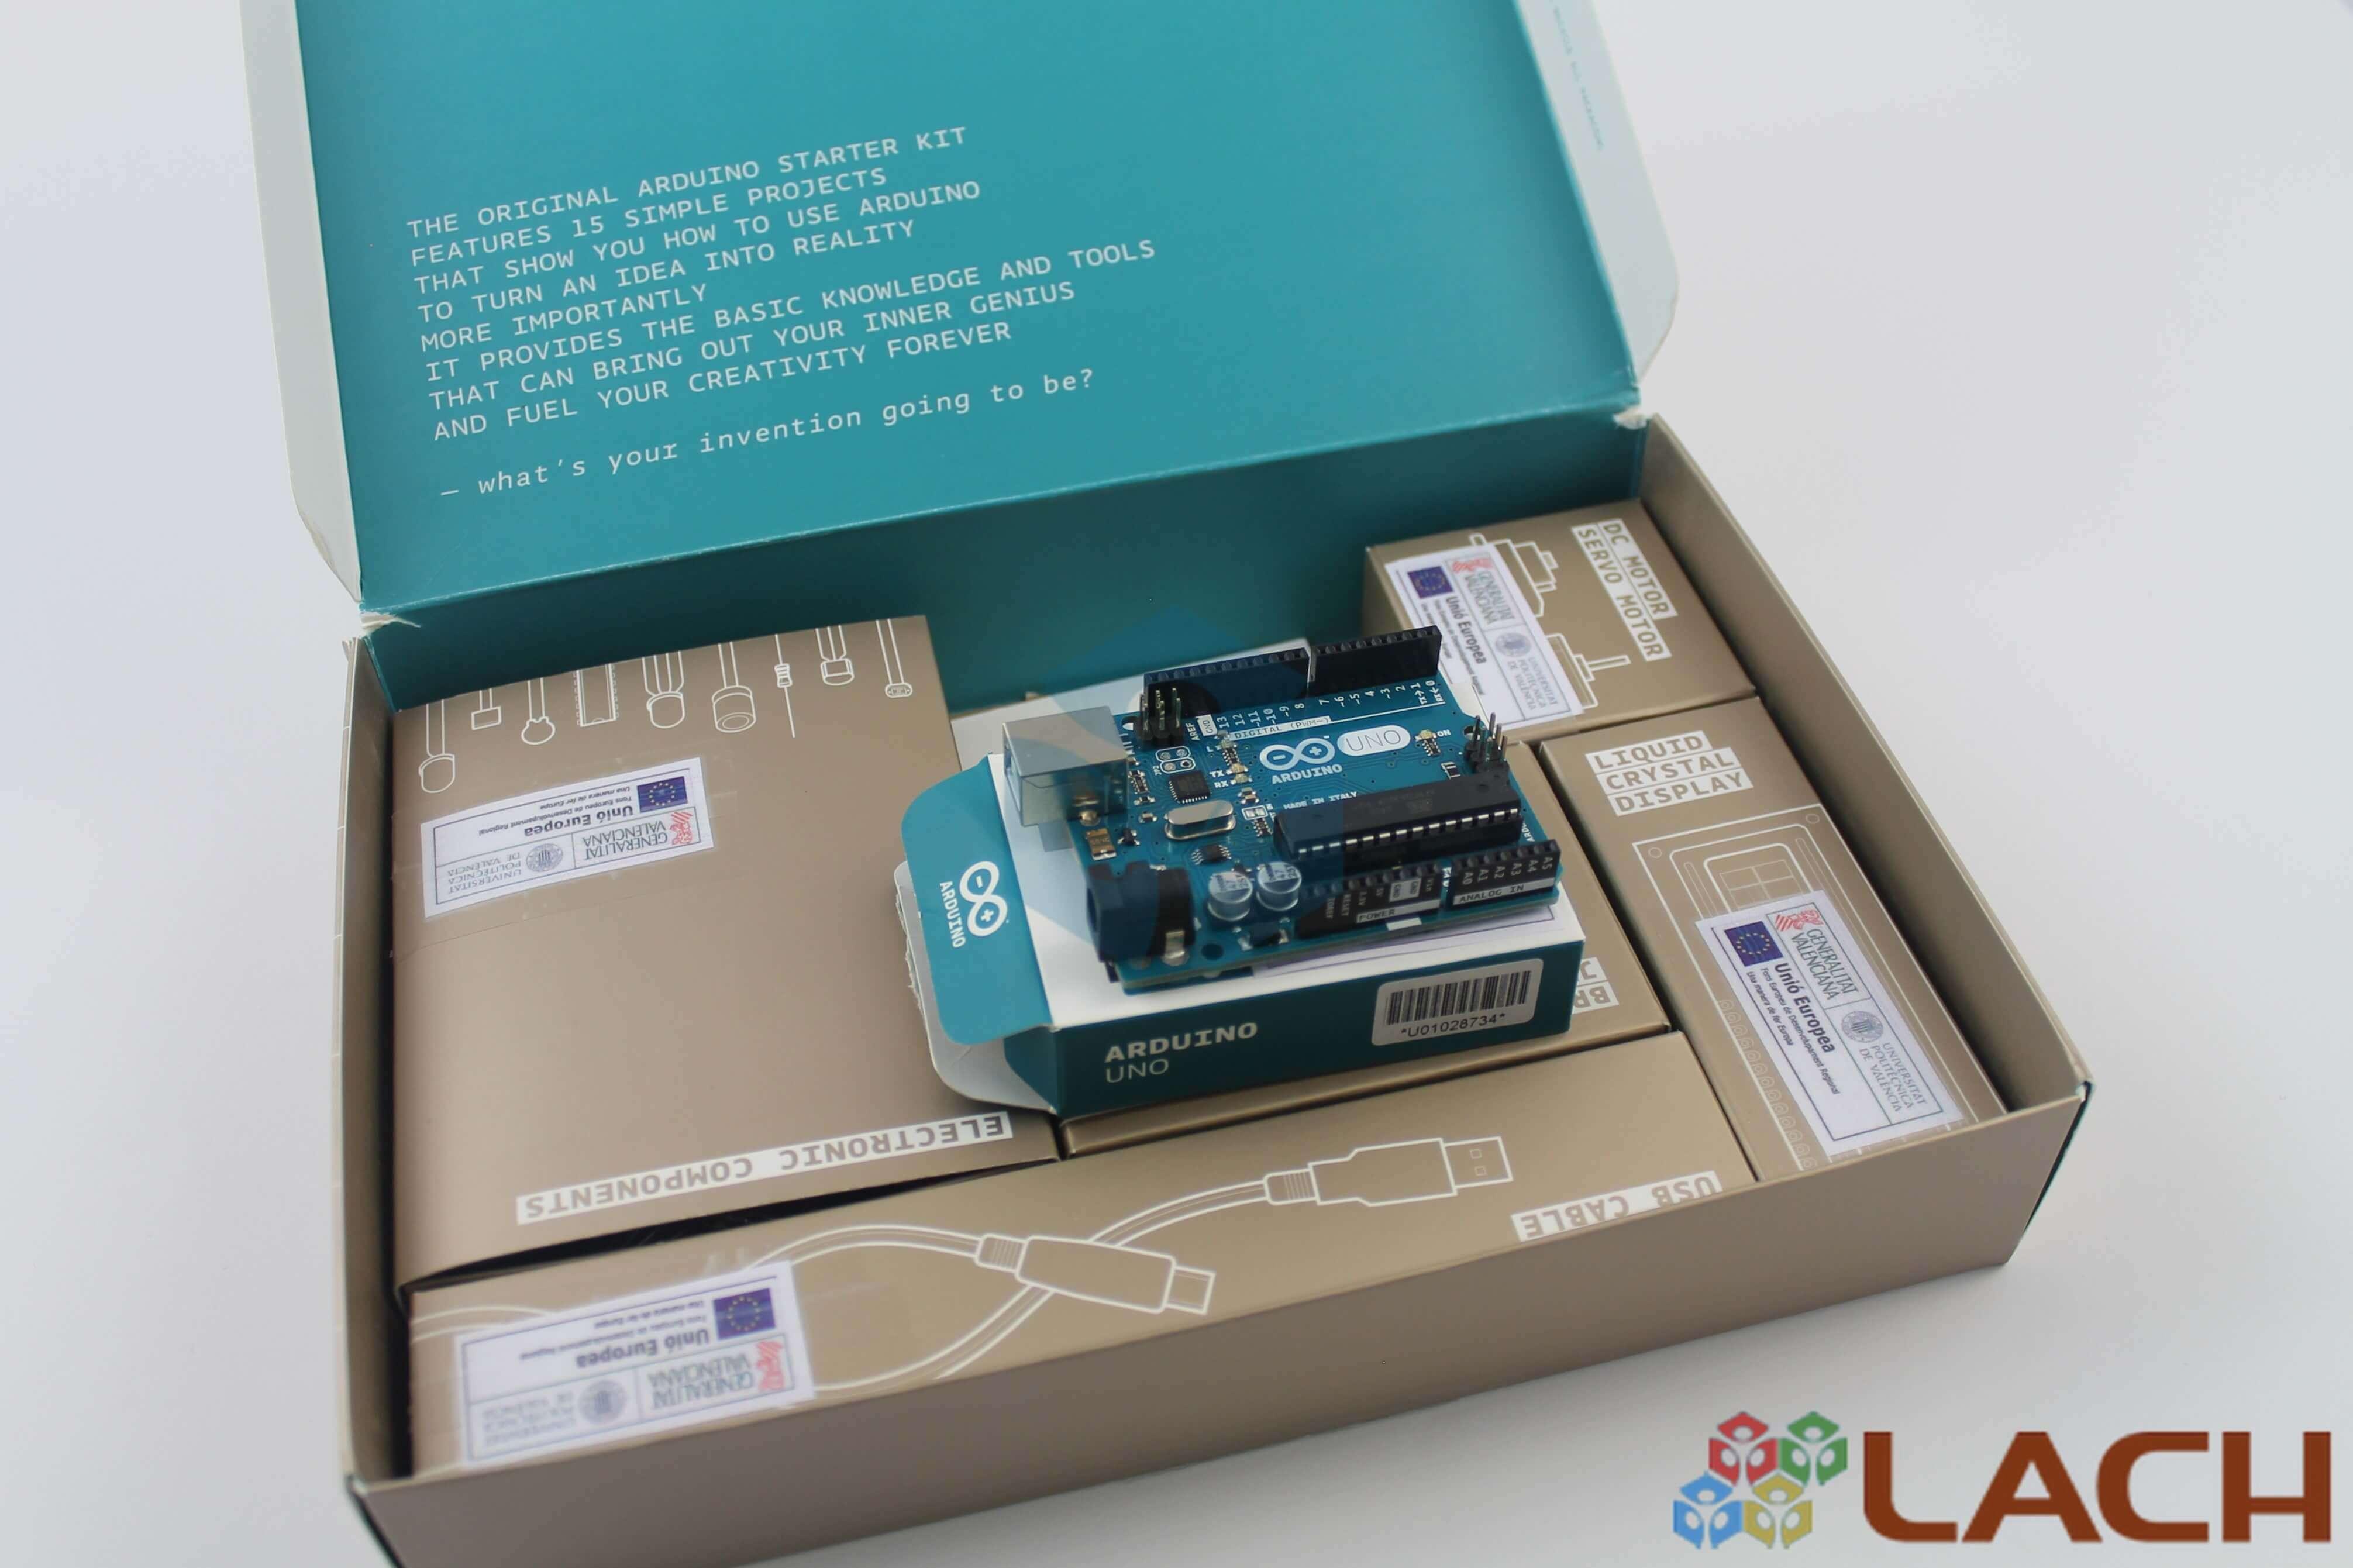 Arduino Starter Kit (Original) with English Manual - Lach